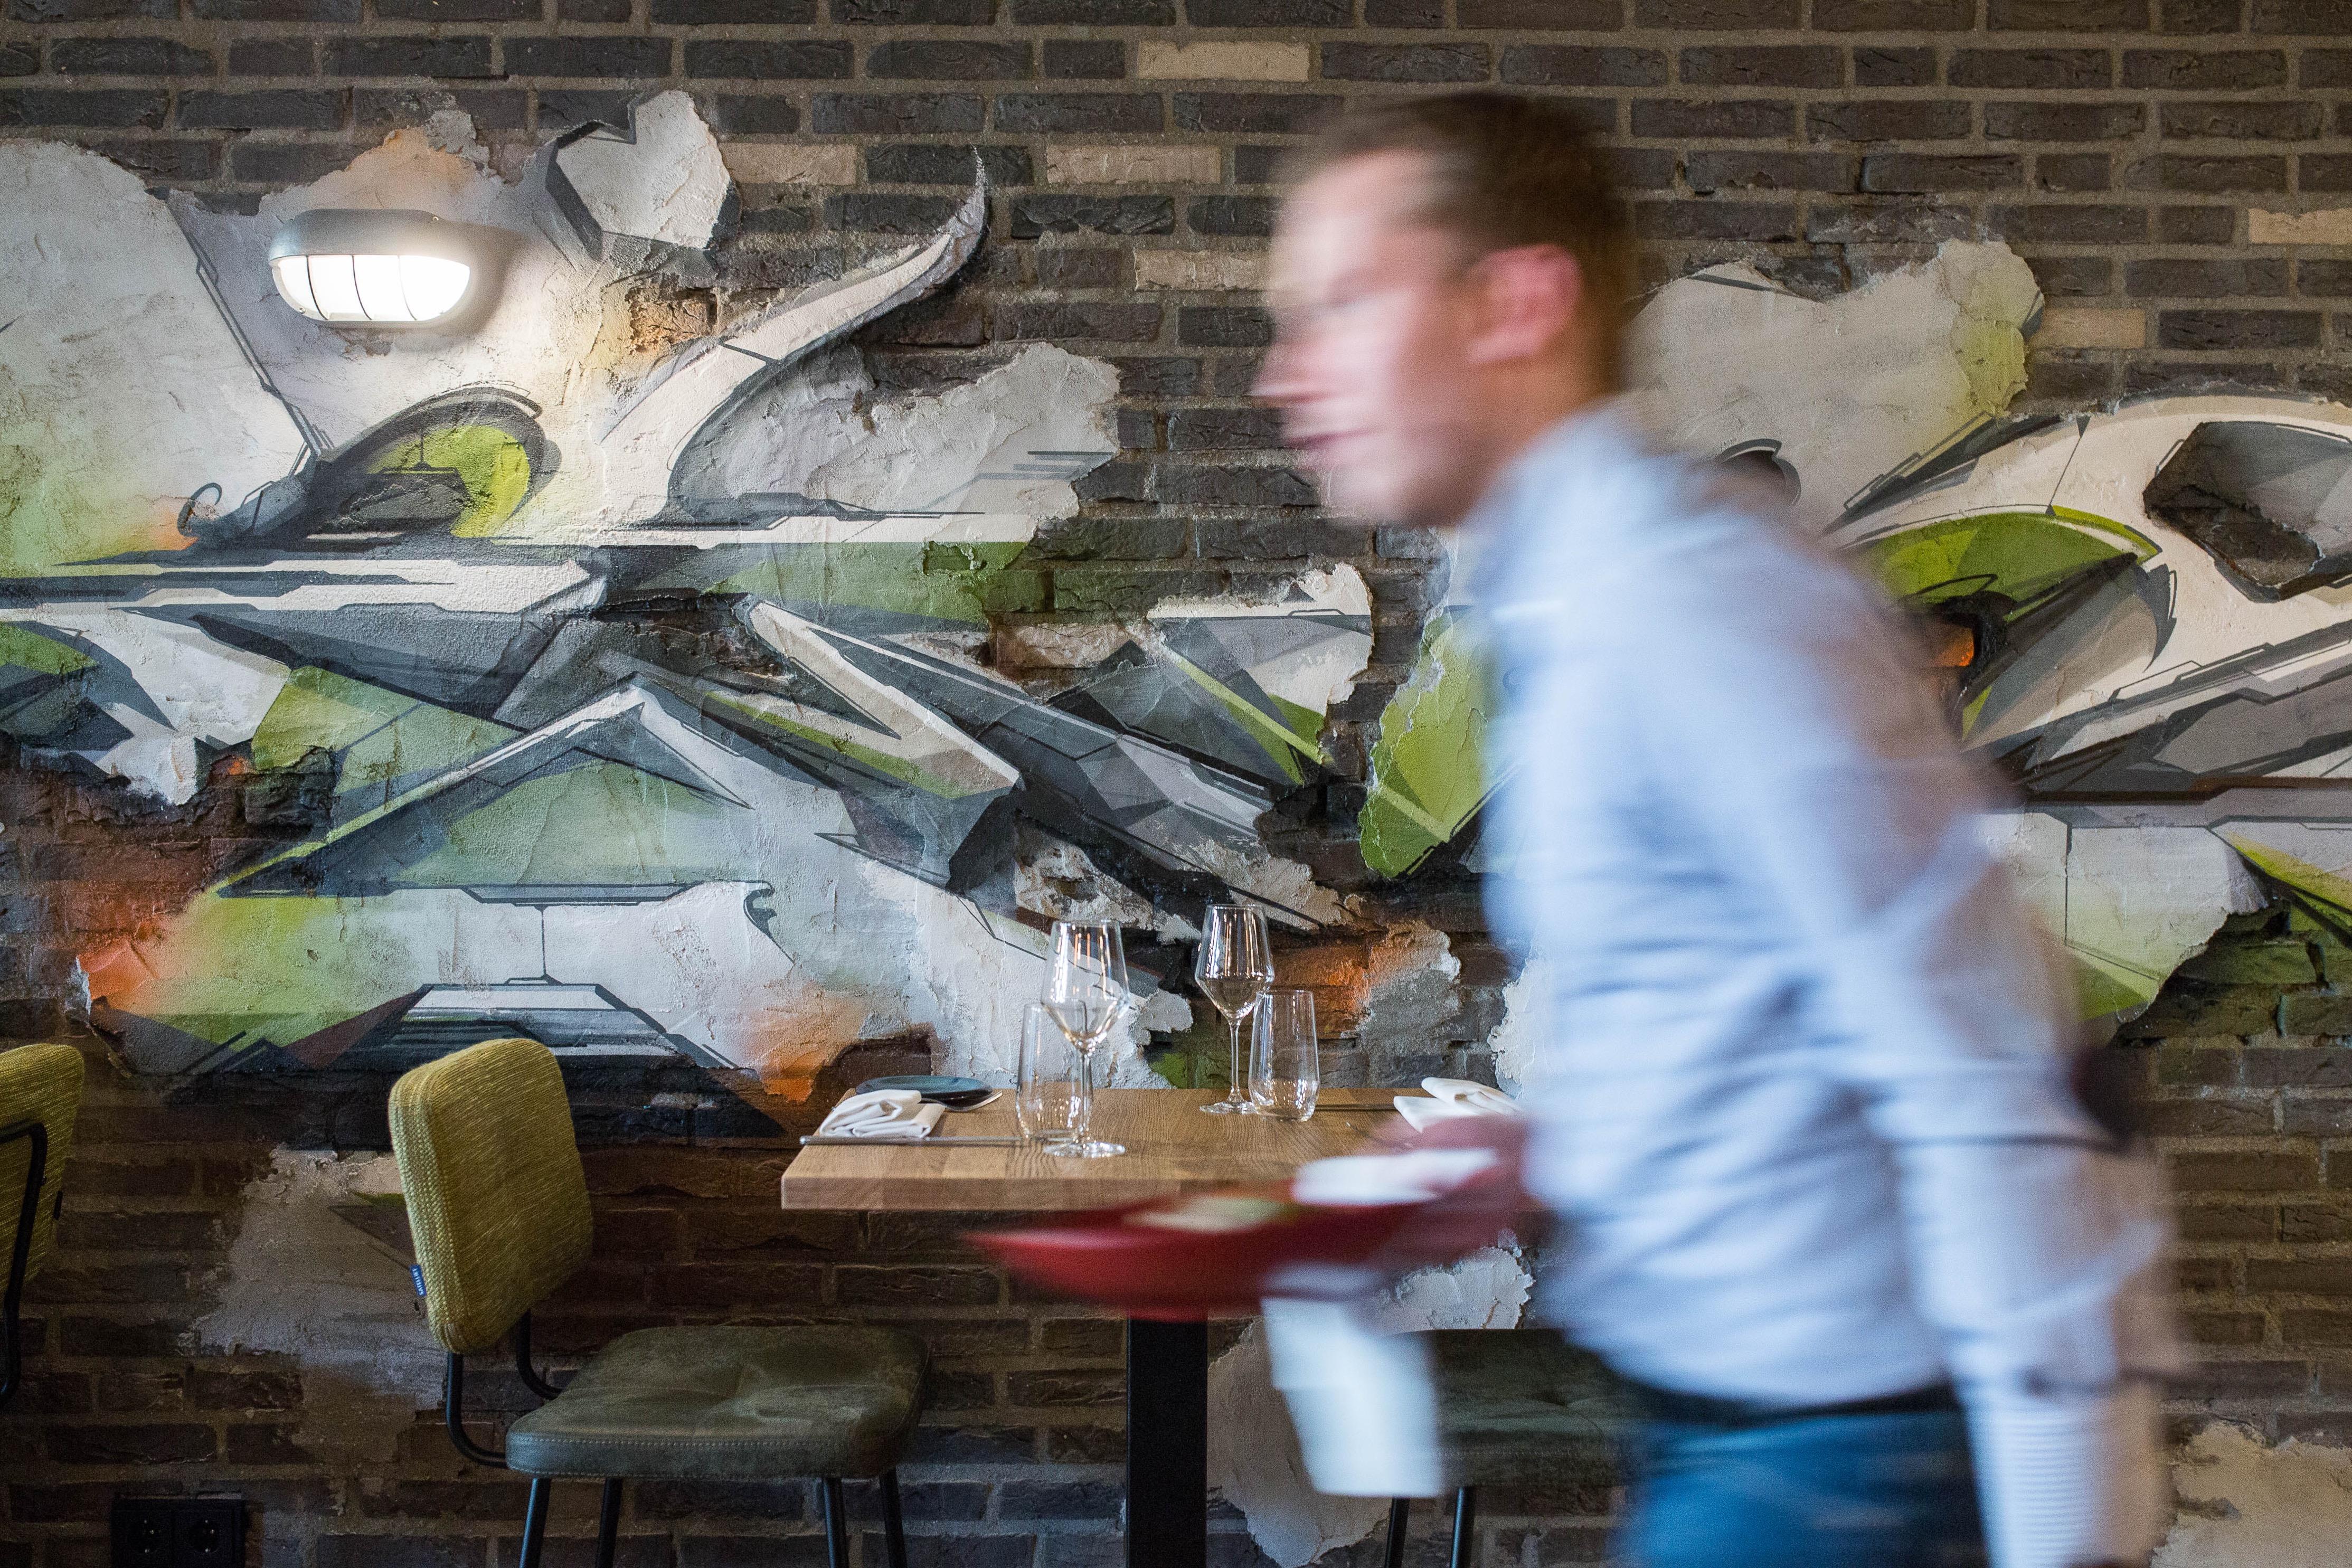 A work by Does - Digital Does Zinc Restaurant_Blickfänger04-smaller